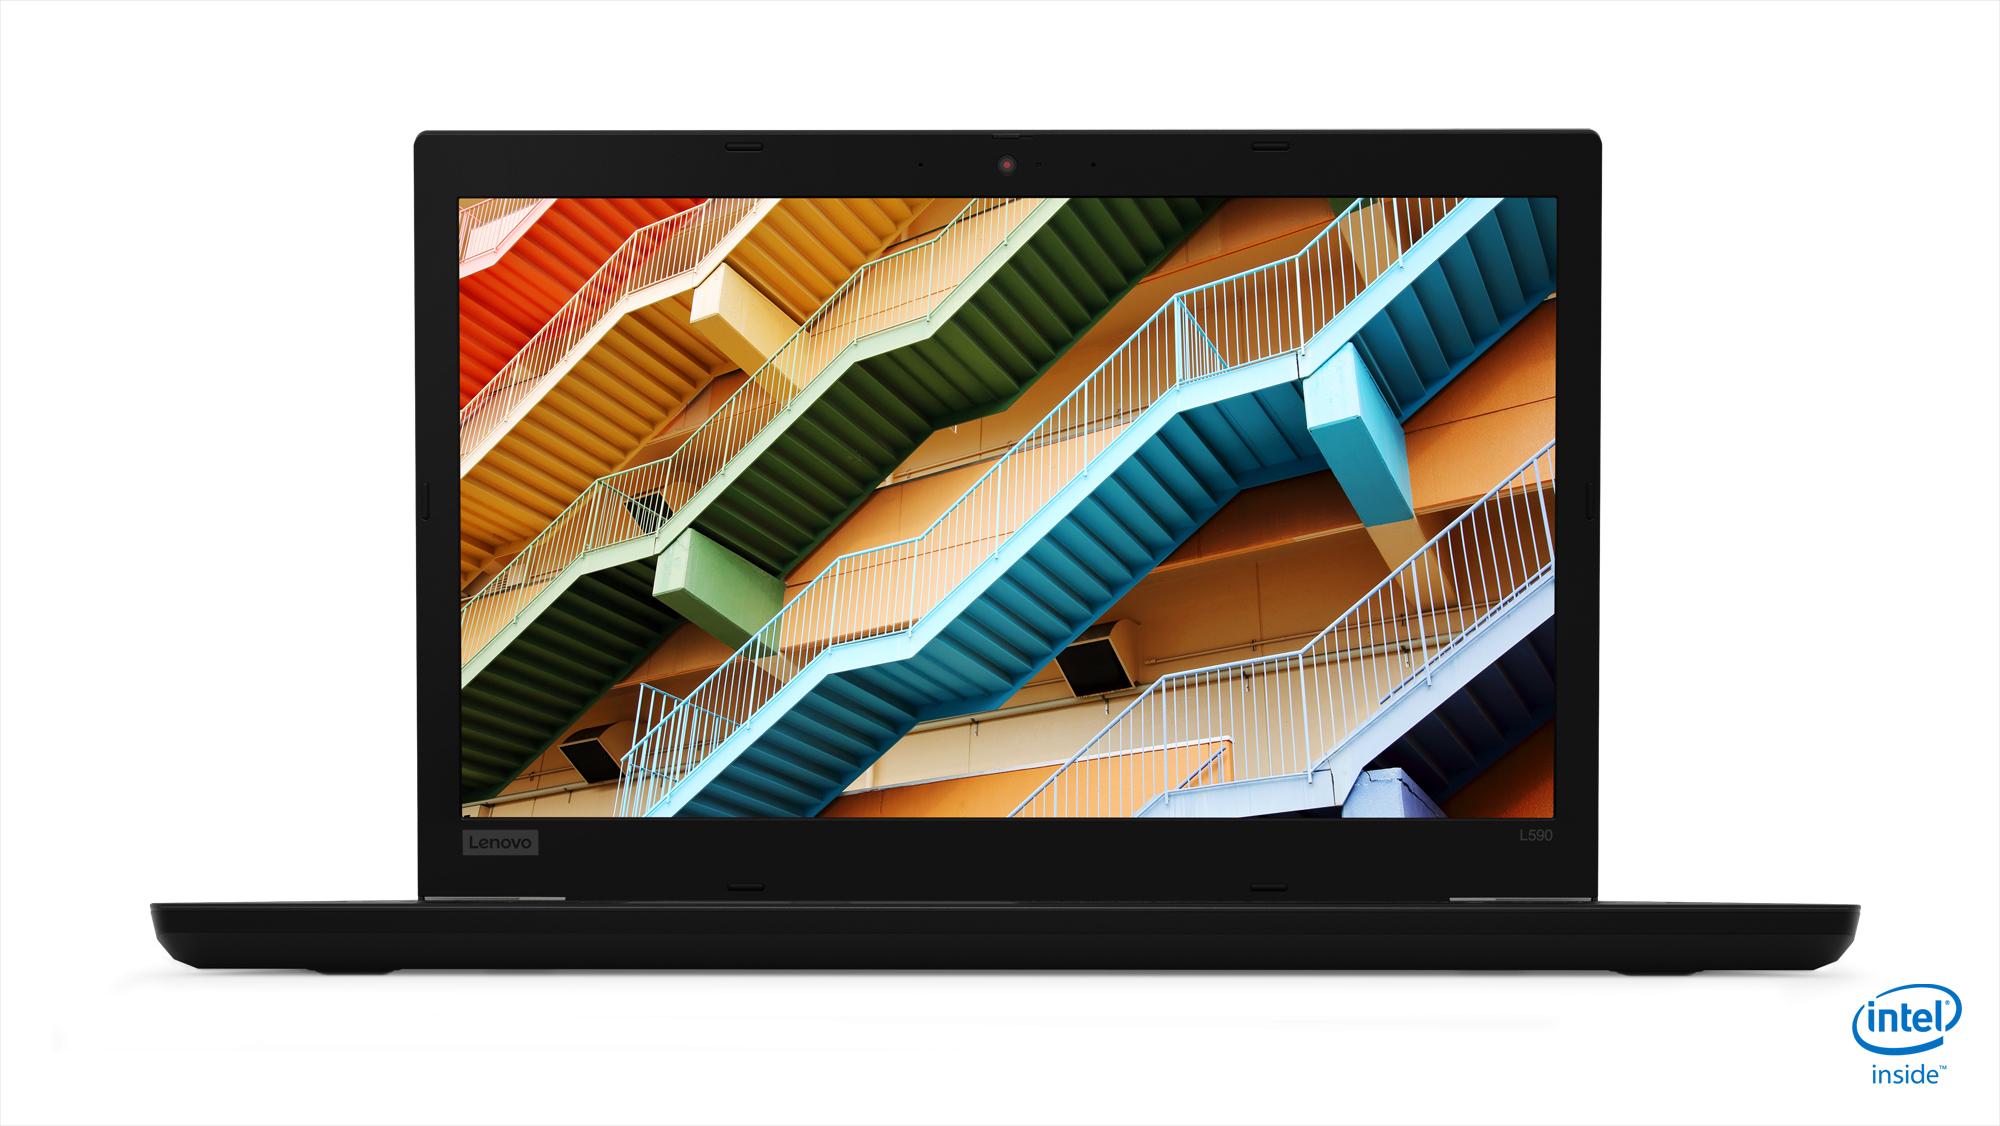 Lenovo ThinkPad L590 Black Notebook 39.6 cm (15.6